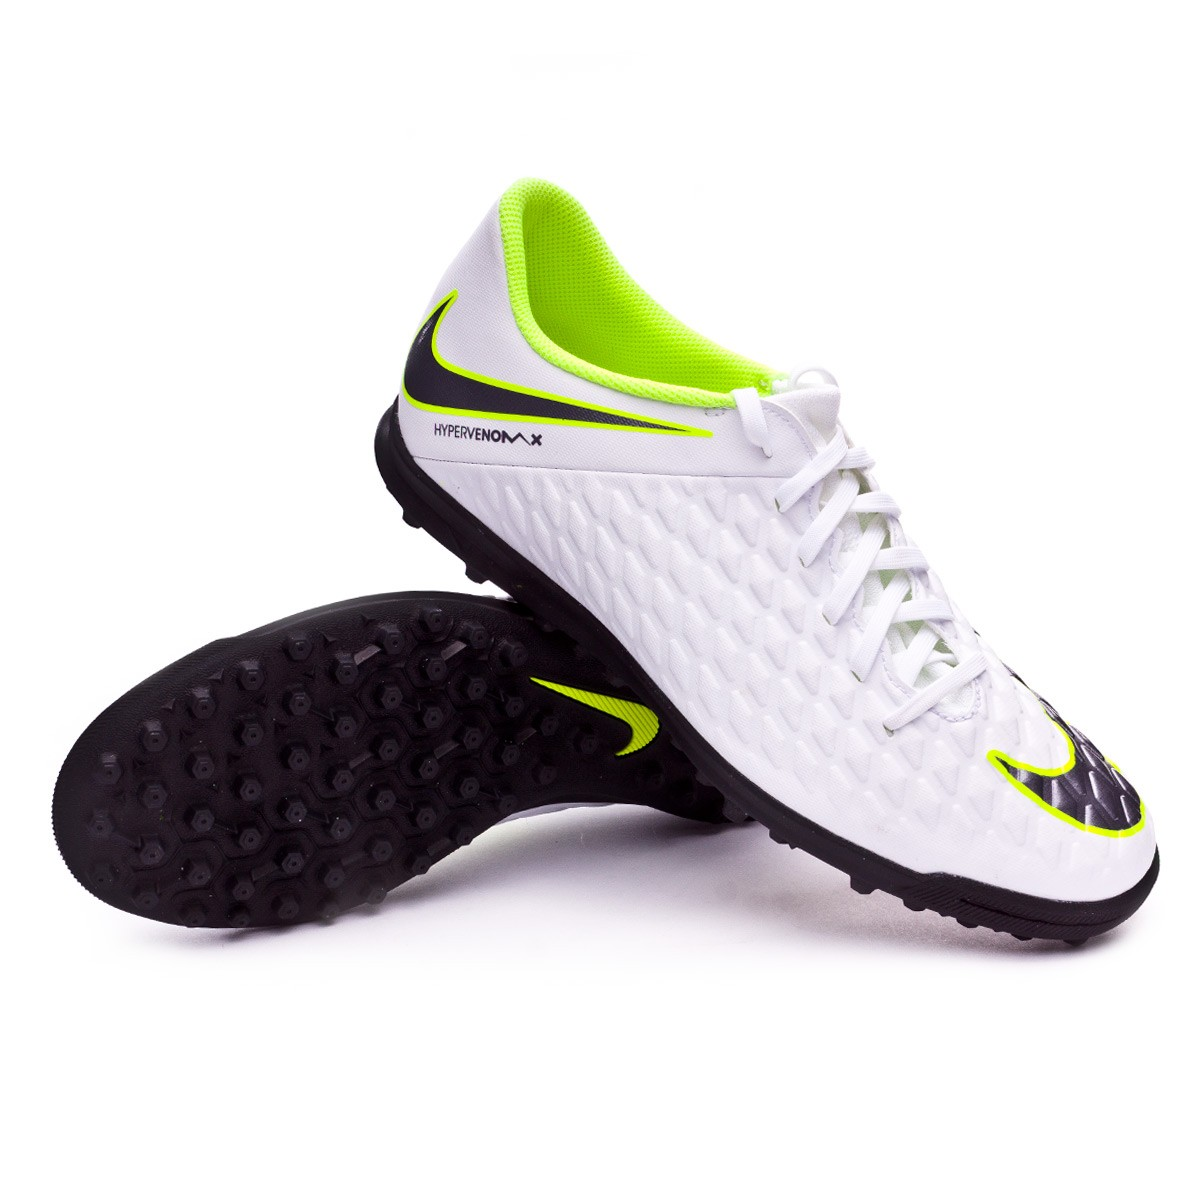 d811bcdc003 Tenis Nike Hypervenom PhantomX III Club Turf White-Metallic cool  grey-Volt-Metallic cool g - Tienda de fútbol Fútbol Emotion